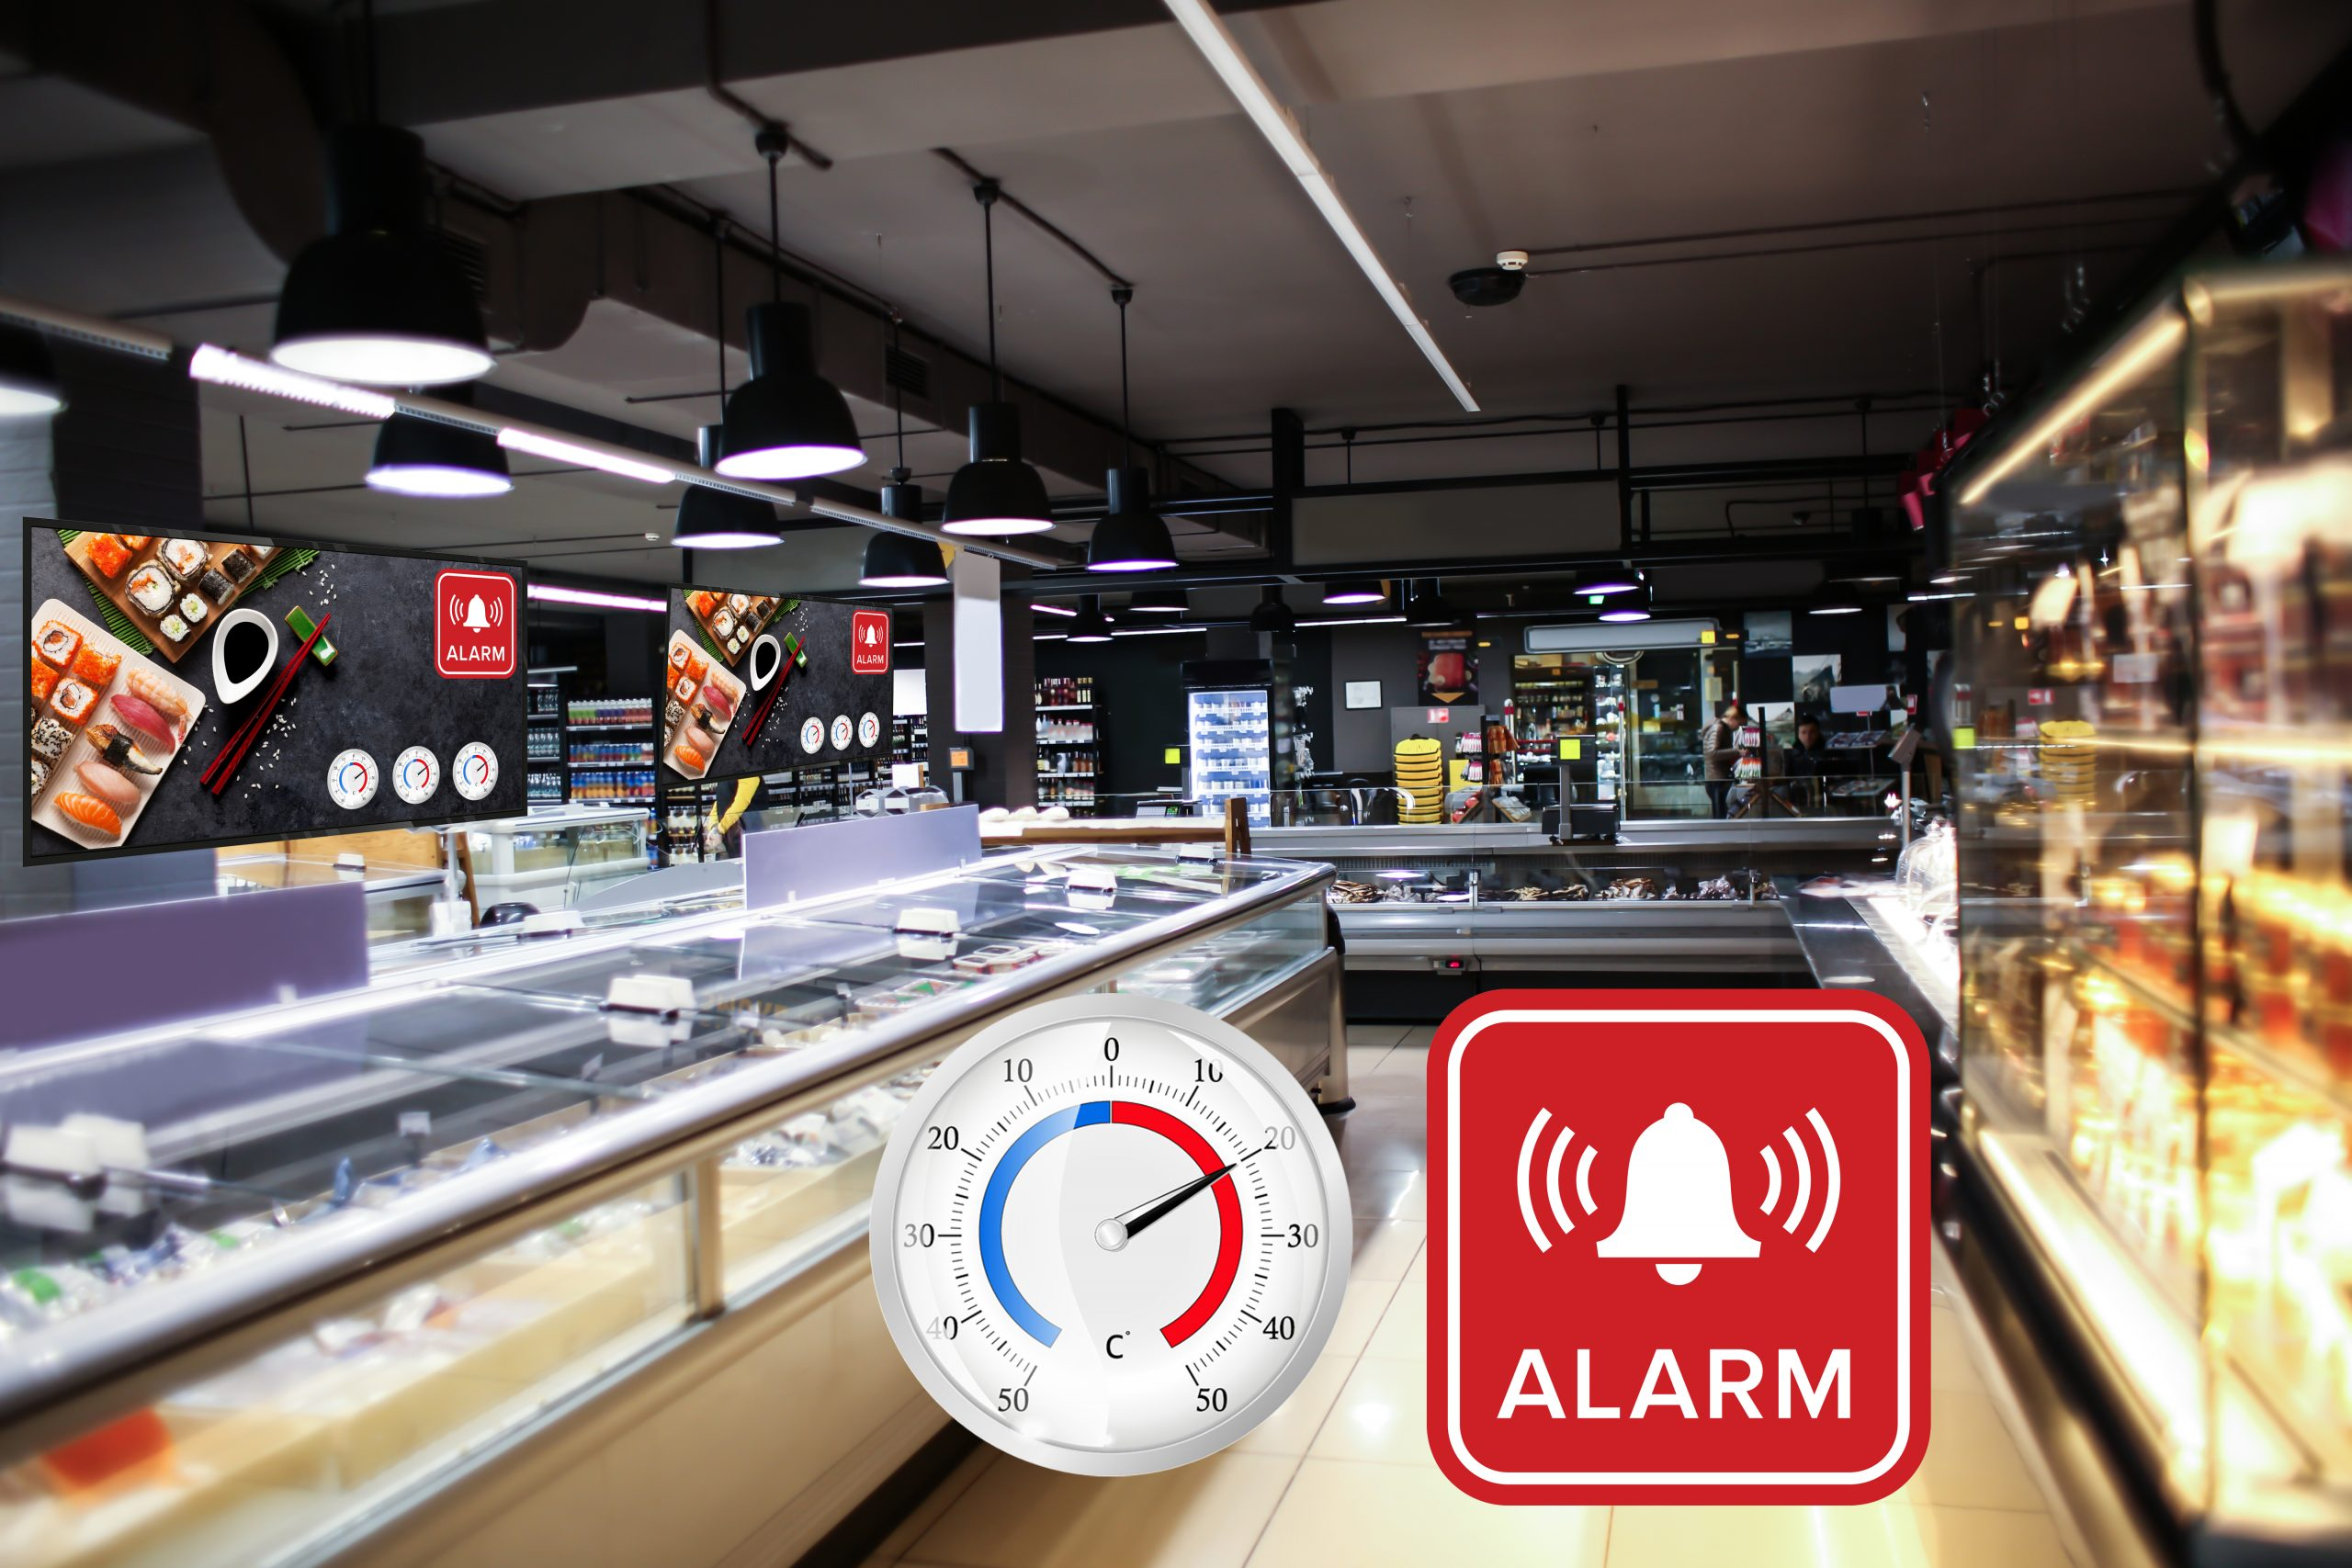 ITMediaConsult AG - Digital Signage IOT Temperatur von Kühltruhen